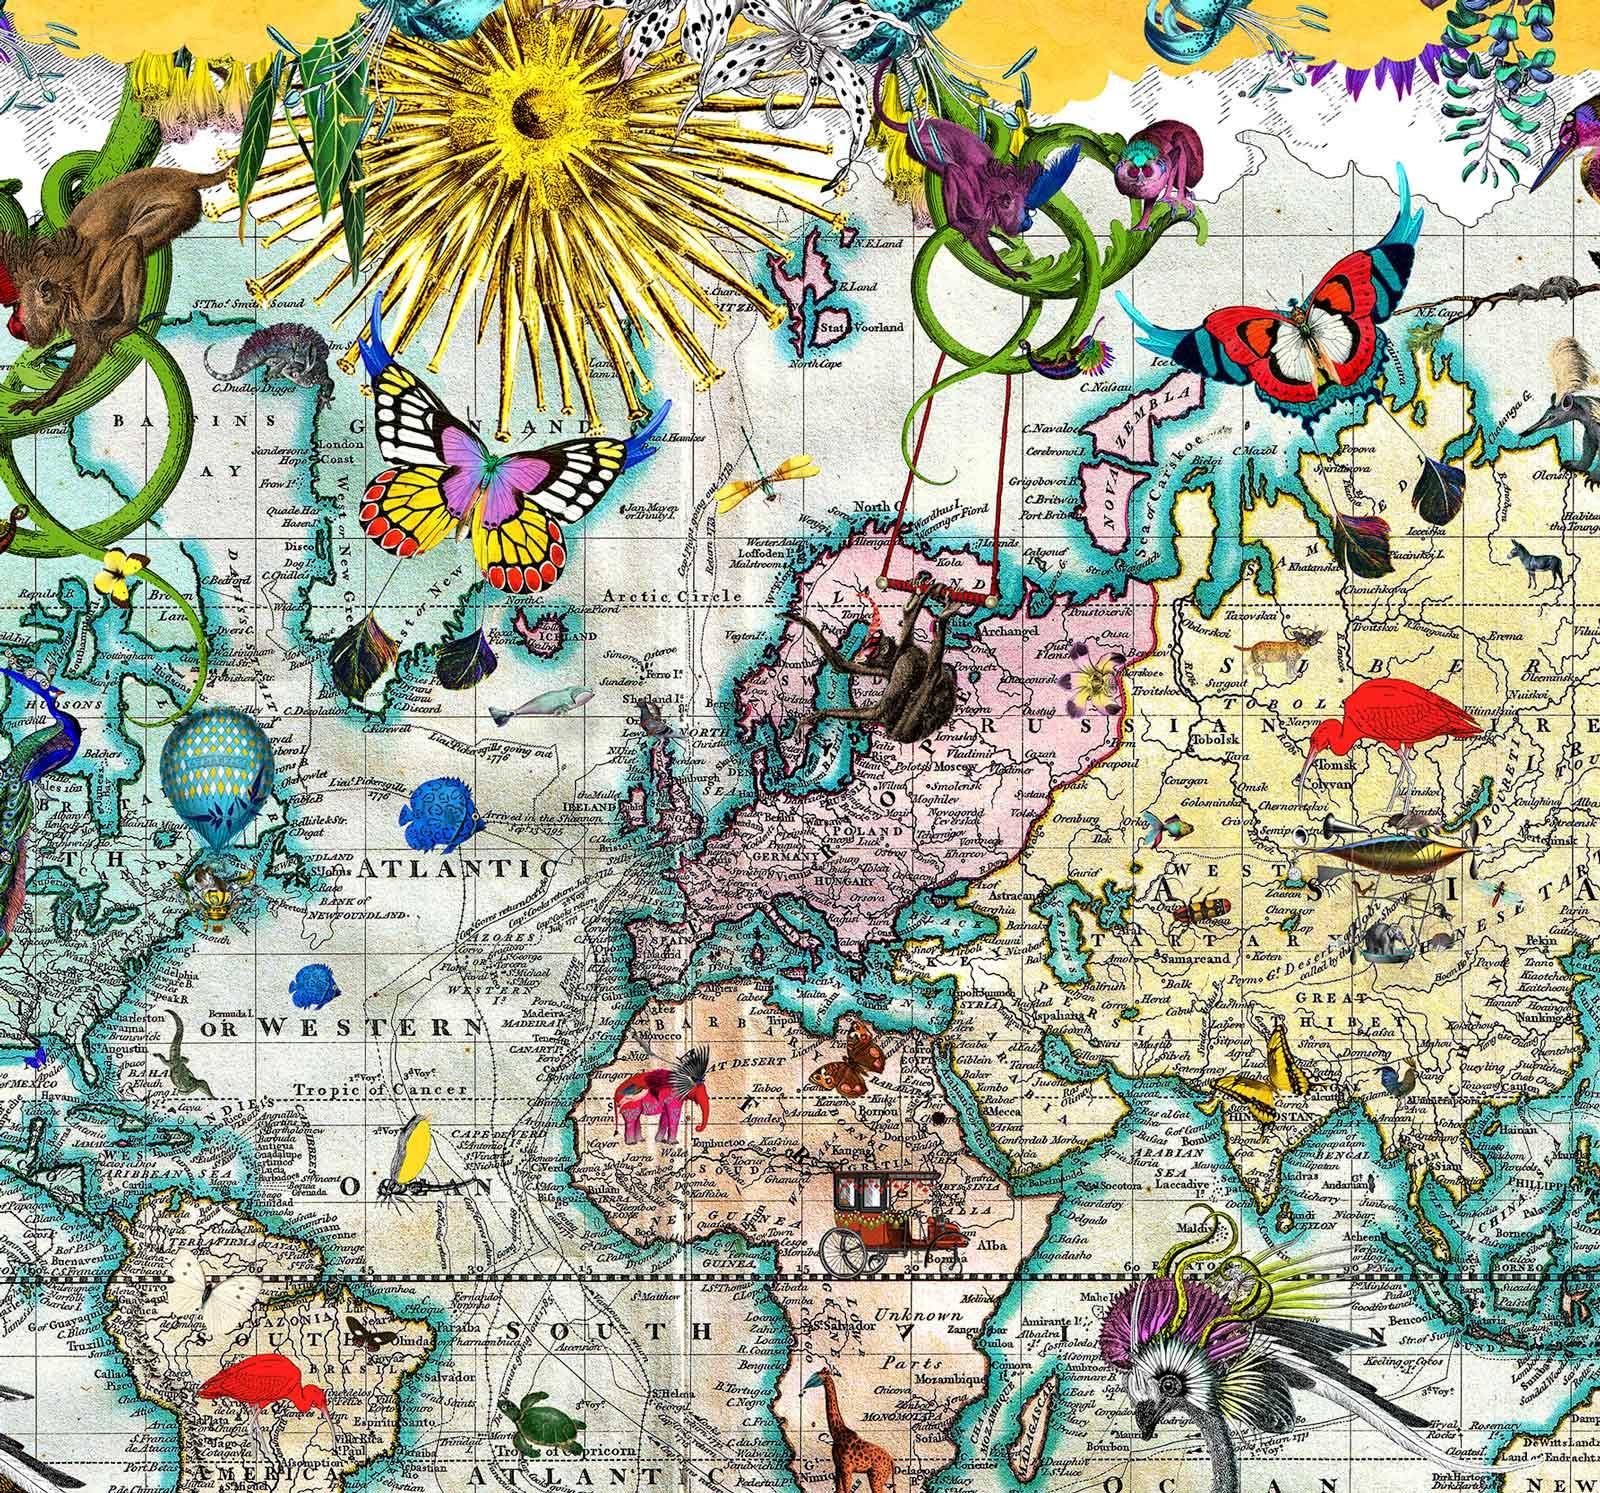 42649_KristjanaWilliams_NavigatorsTracks_d2,